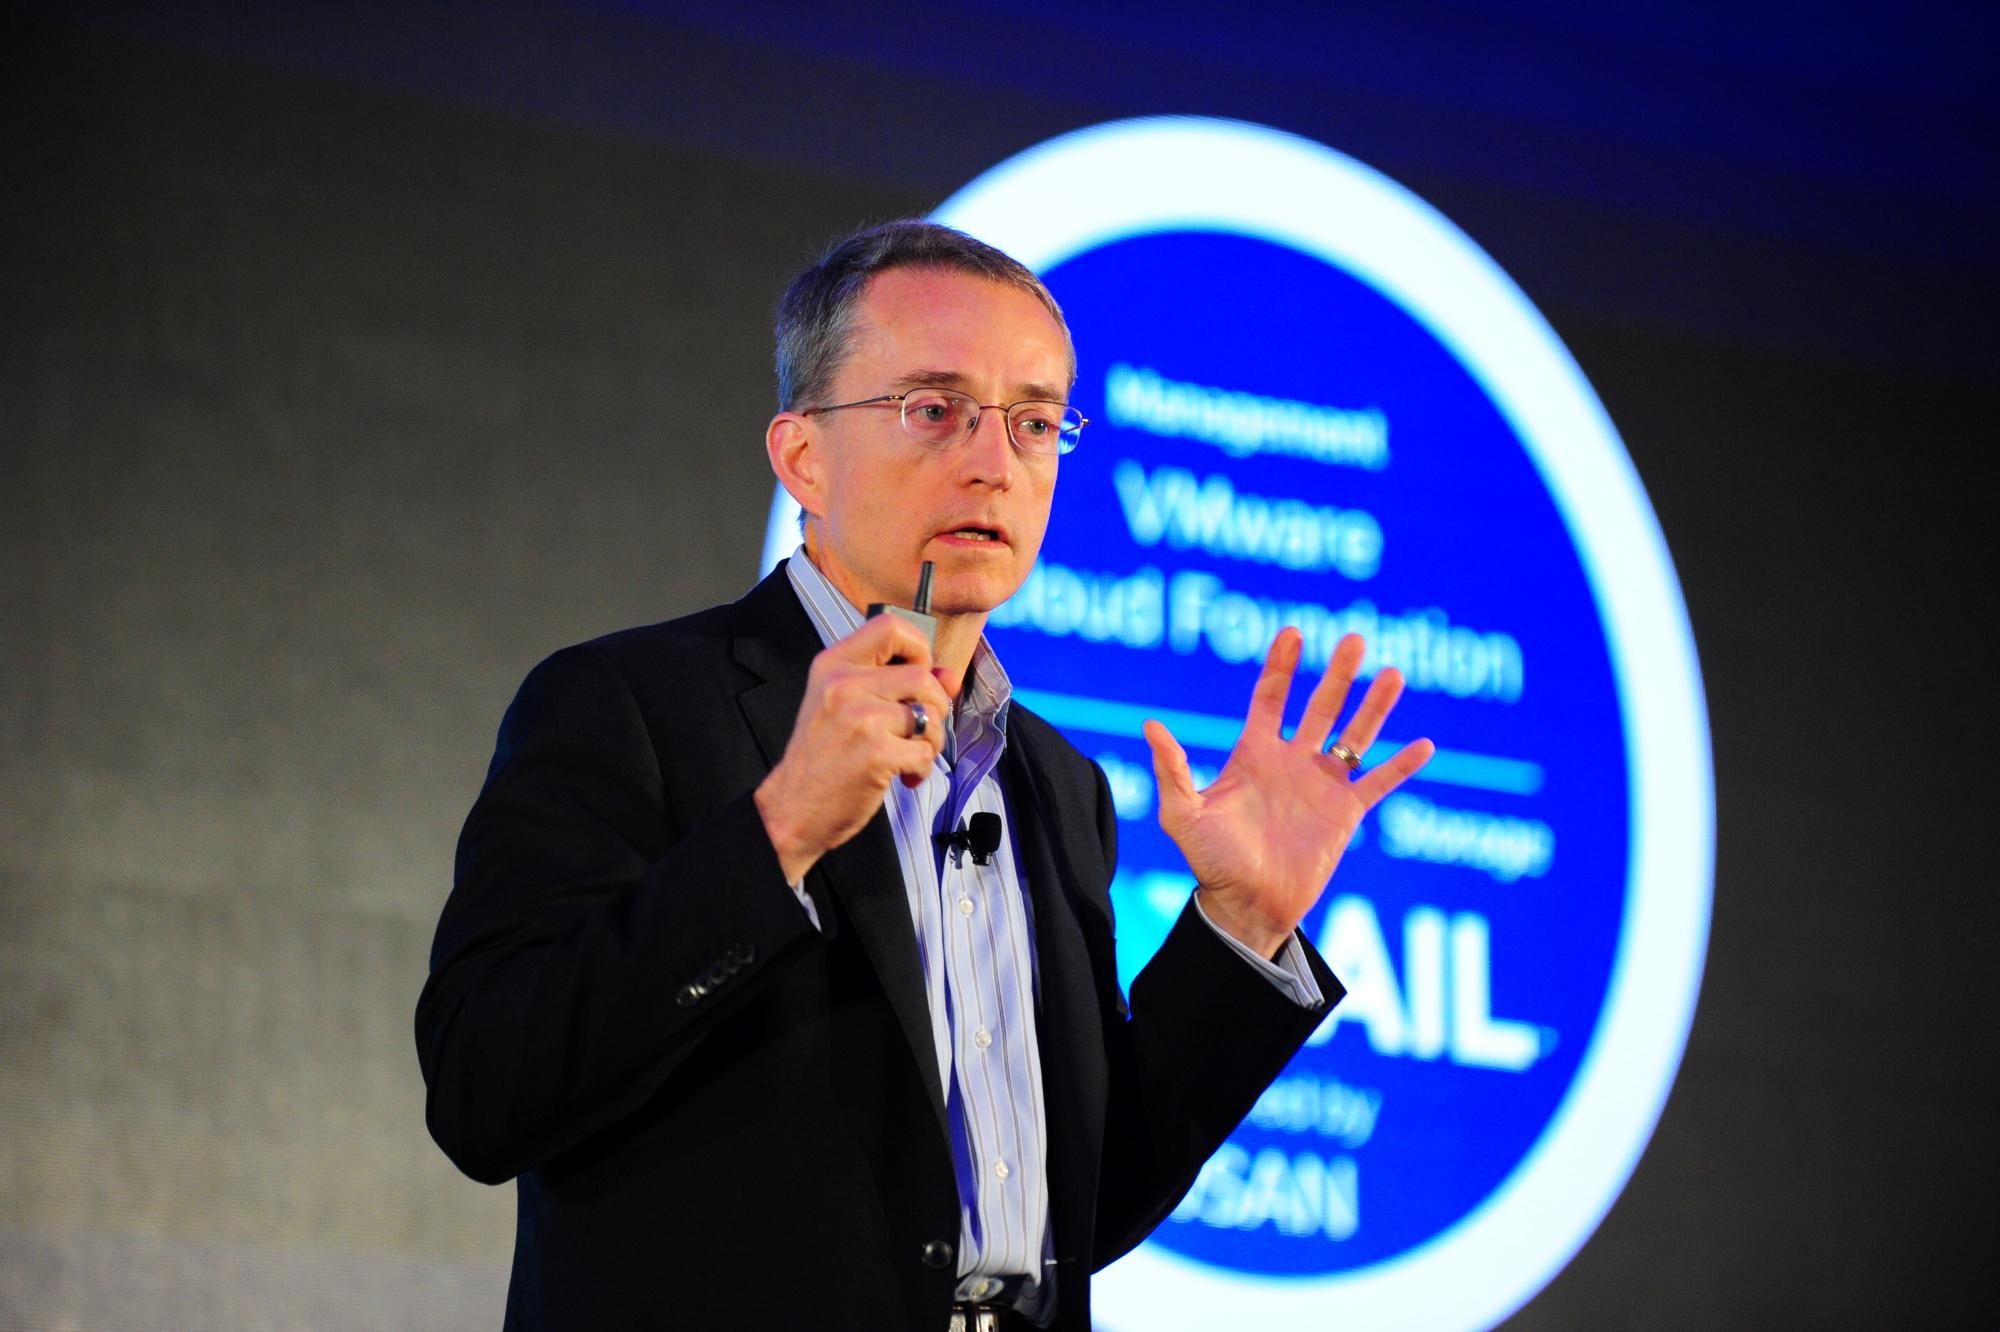 Pat Gelsingger, Chief Executive Officer VMware